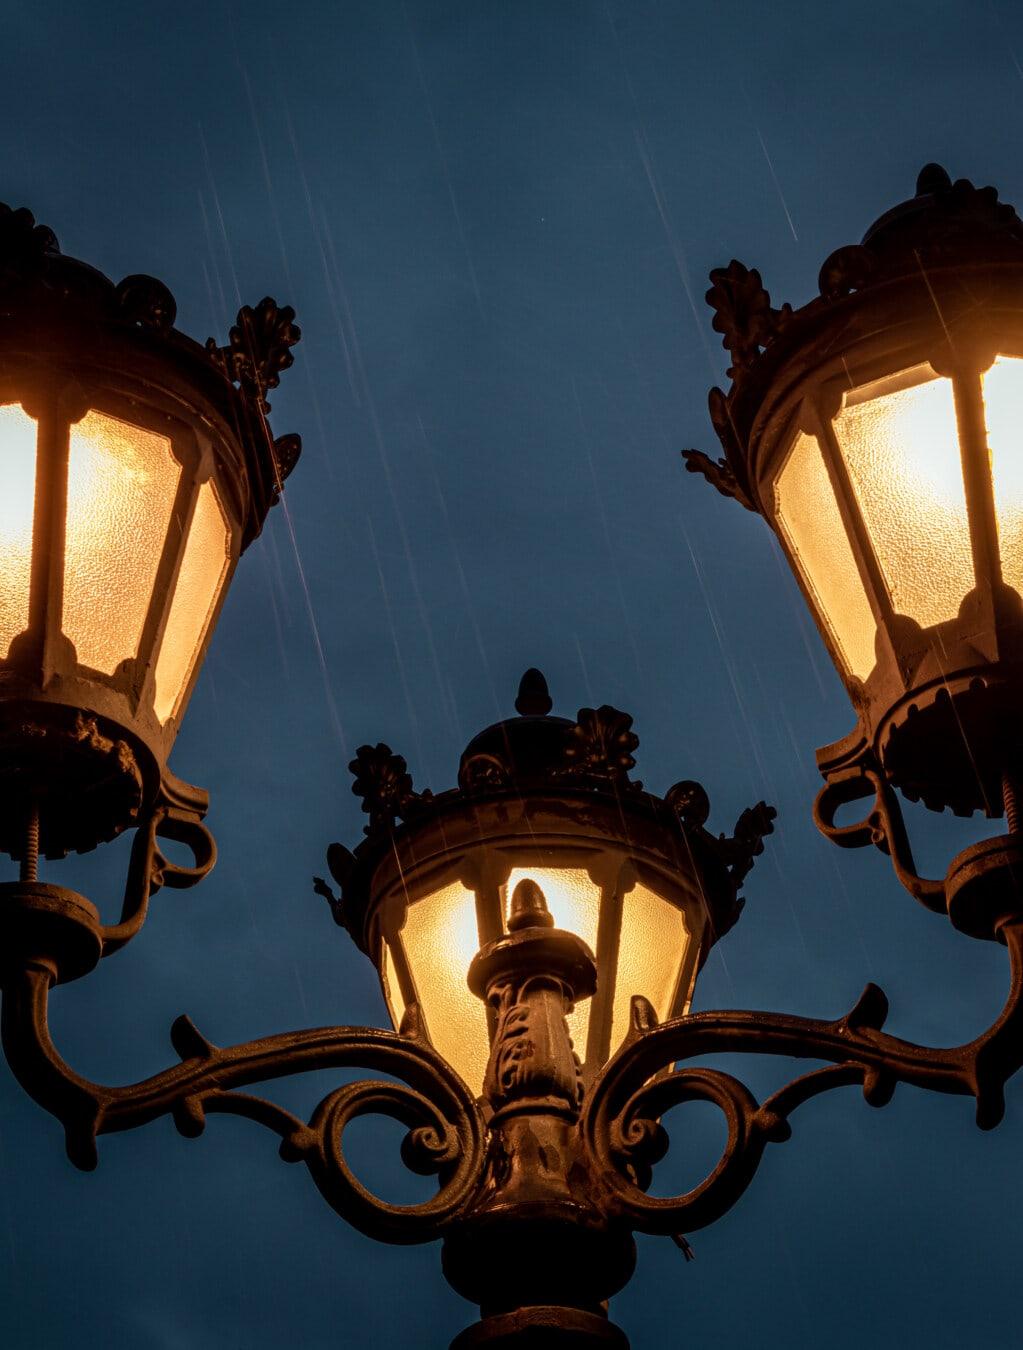 rain, evening, night, lantern, baroque, lamp, cast iron, classic, light, old